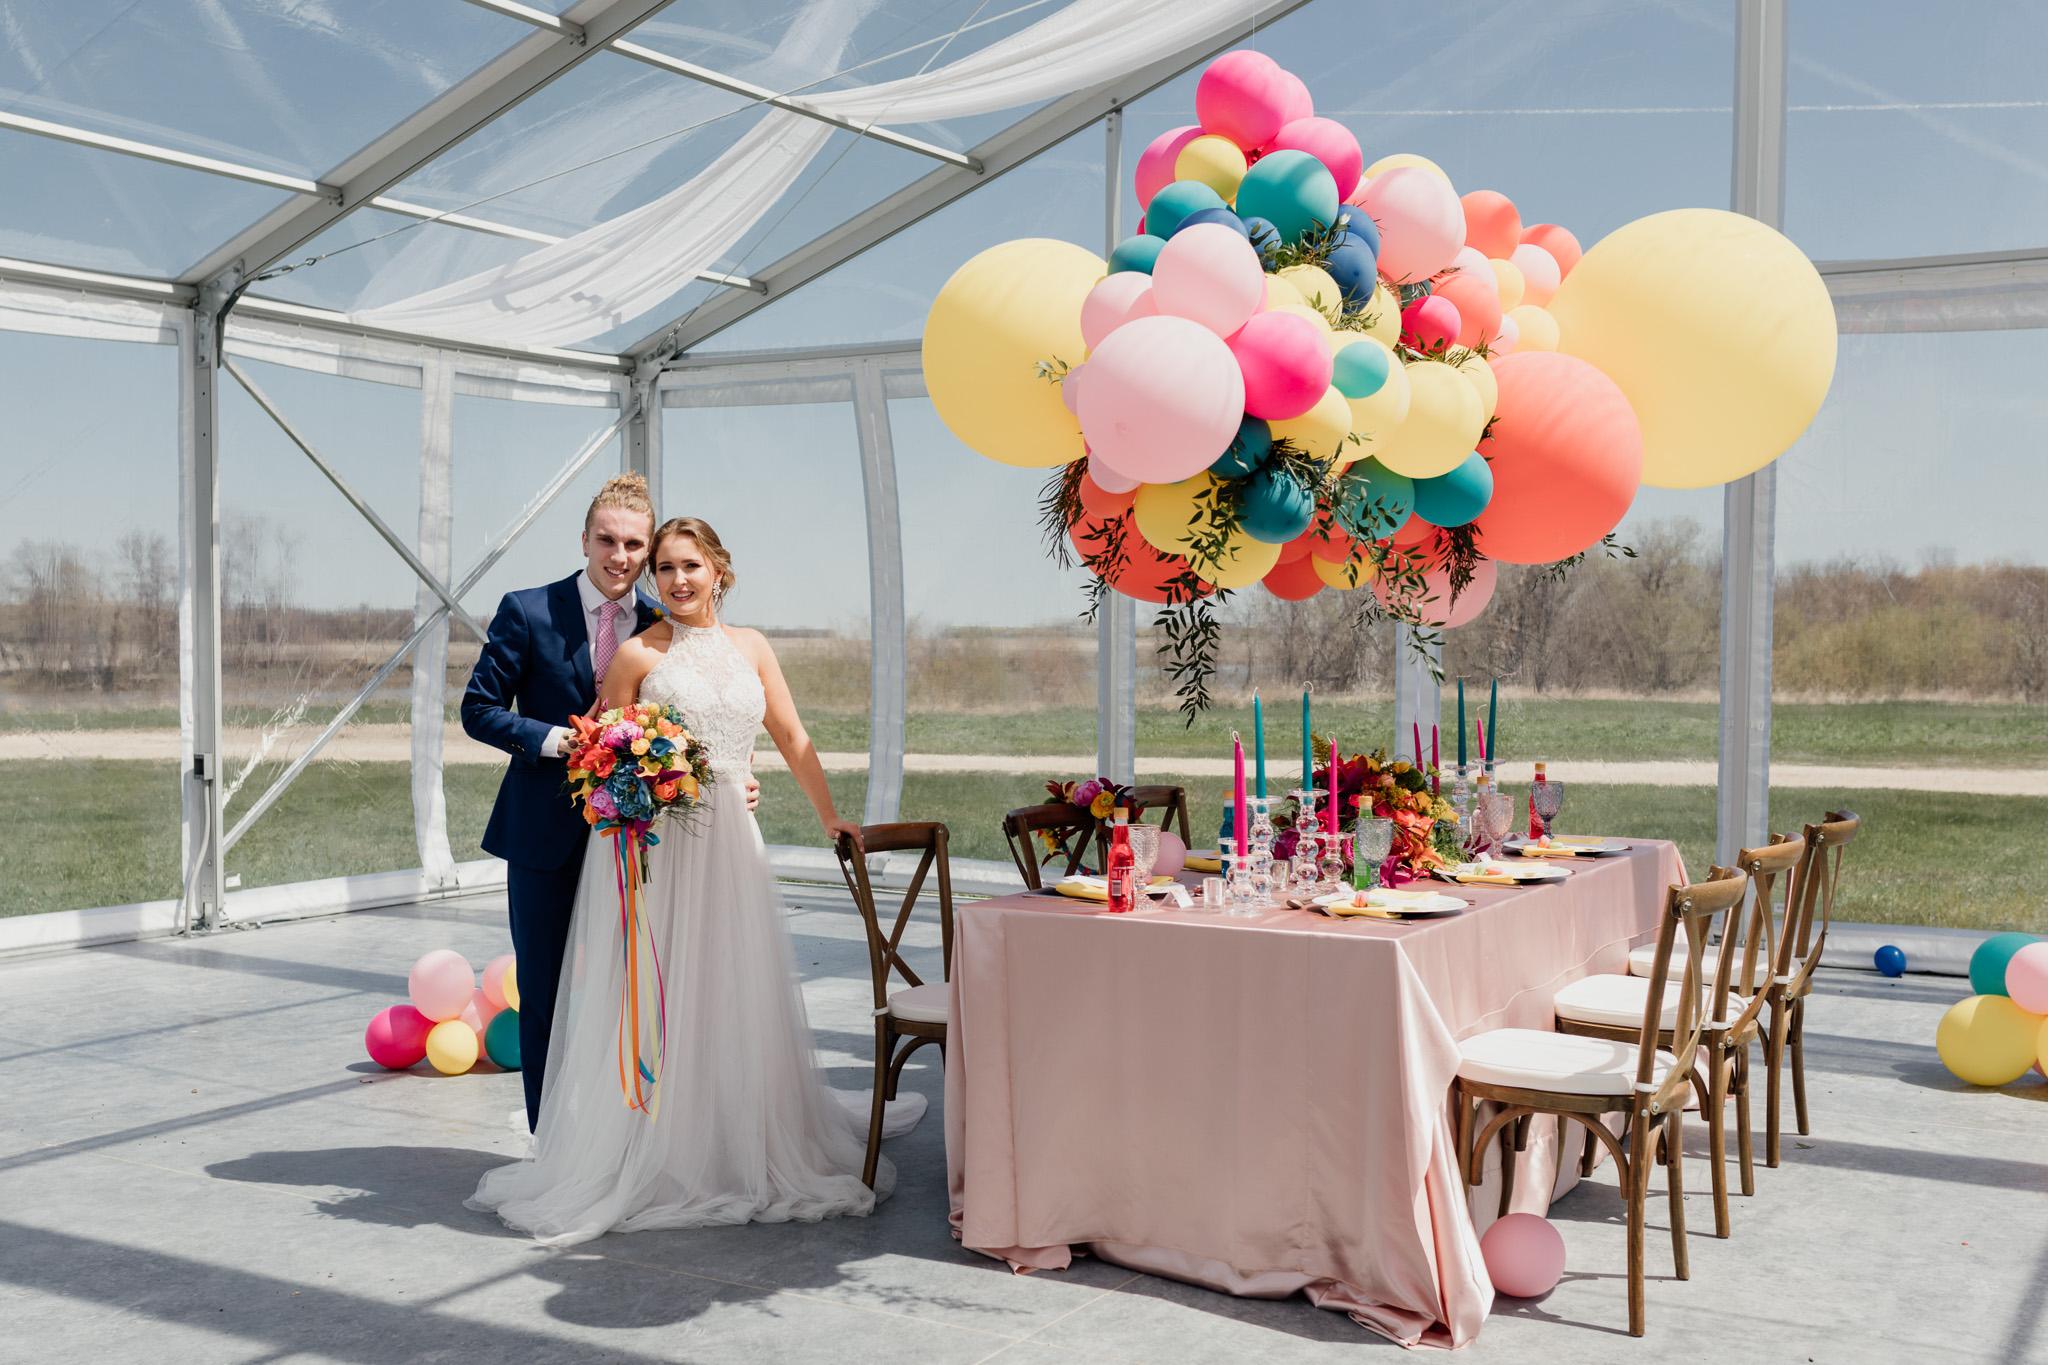 winnipeg-wedding-starlit point-58.jpg